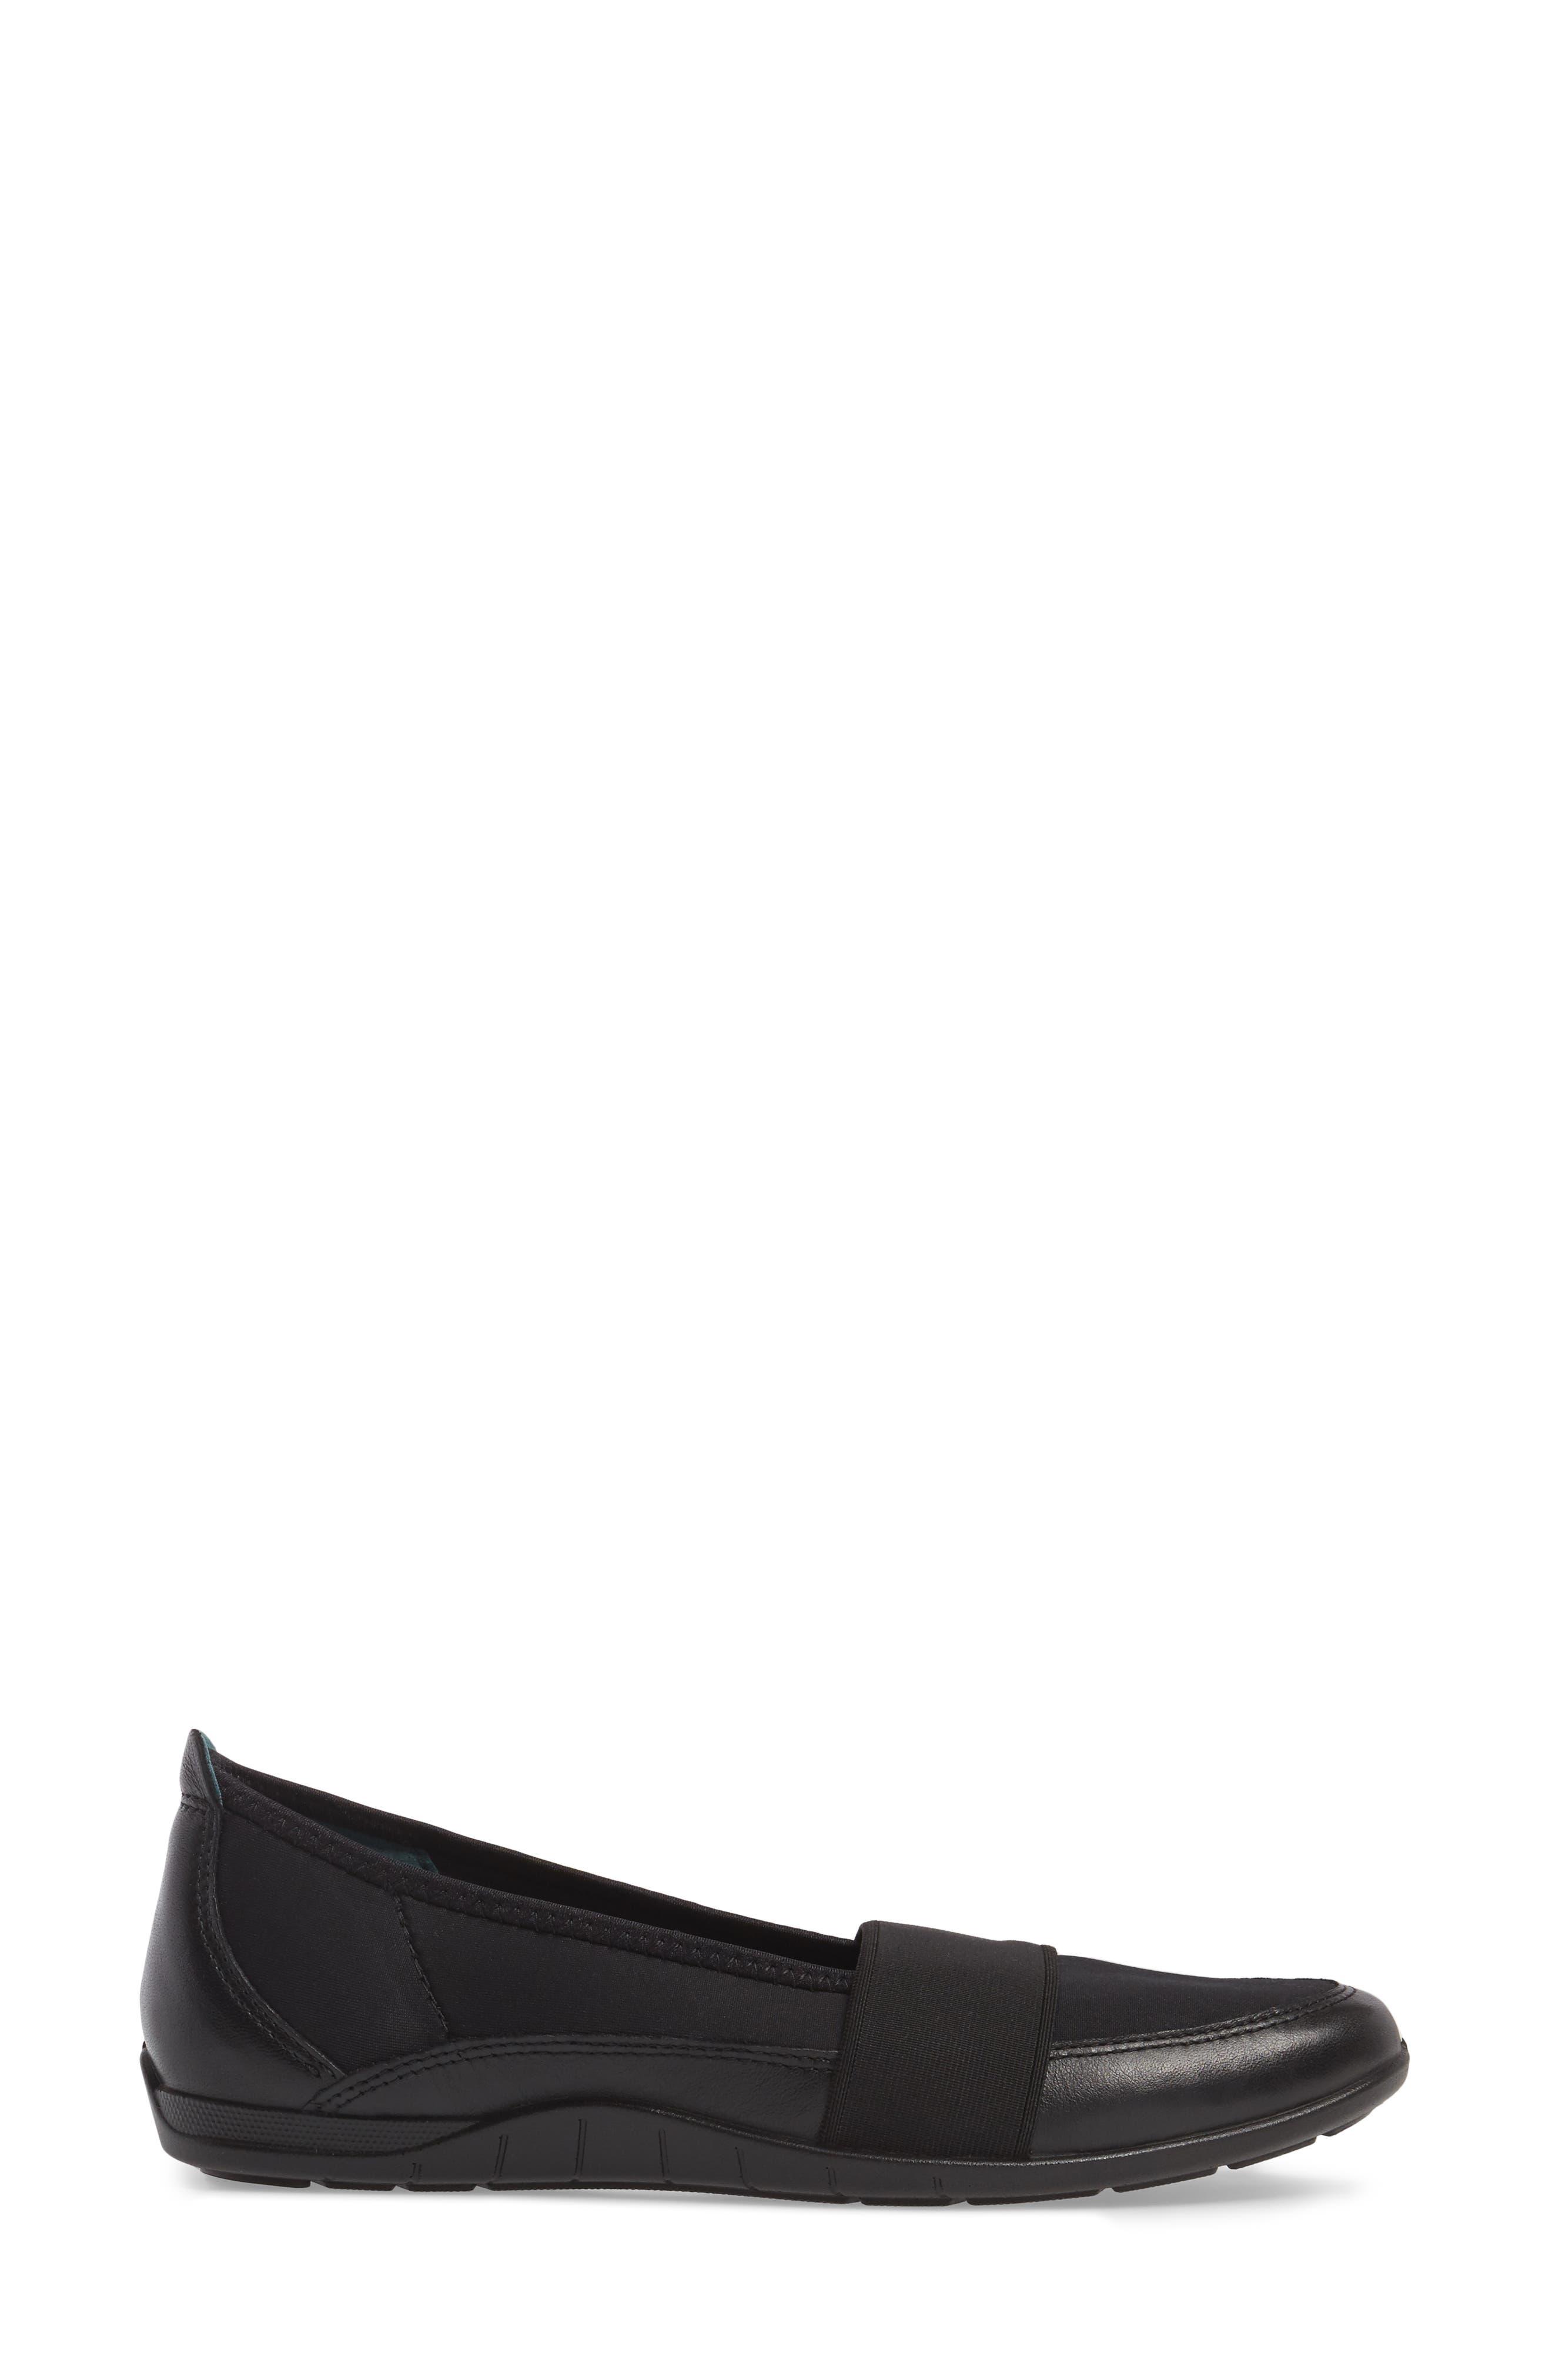 'Bluma' Slip-On Sneaker,                             Alternate thumbnail 3, color,                             Black Leather